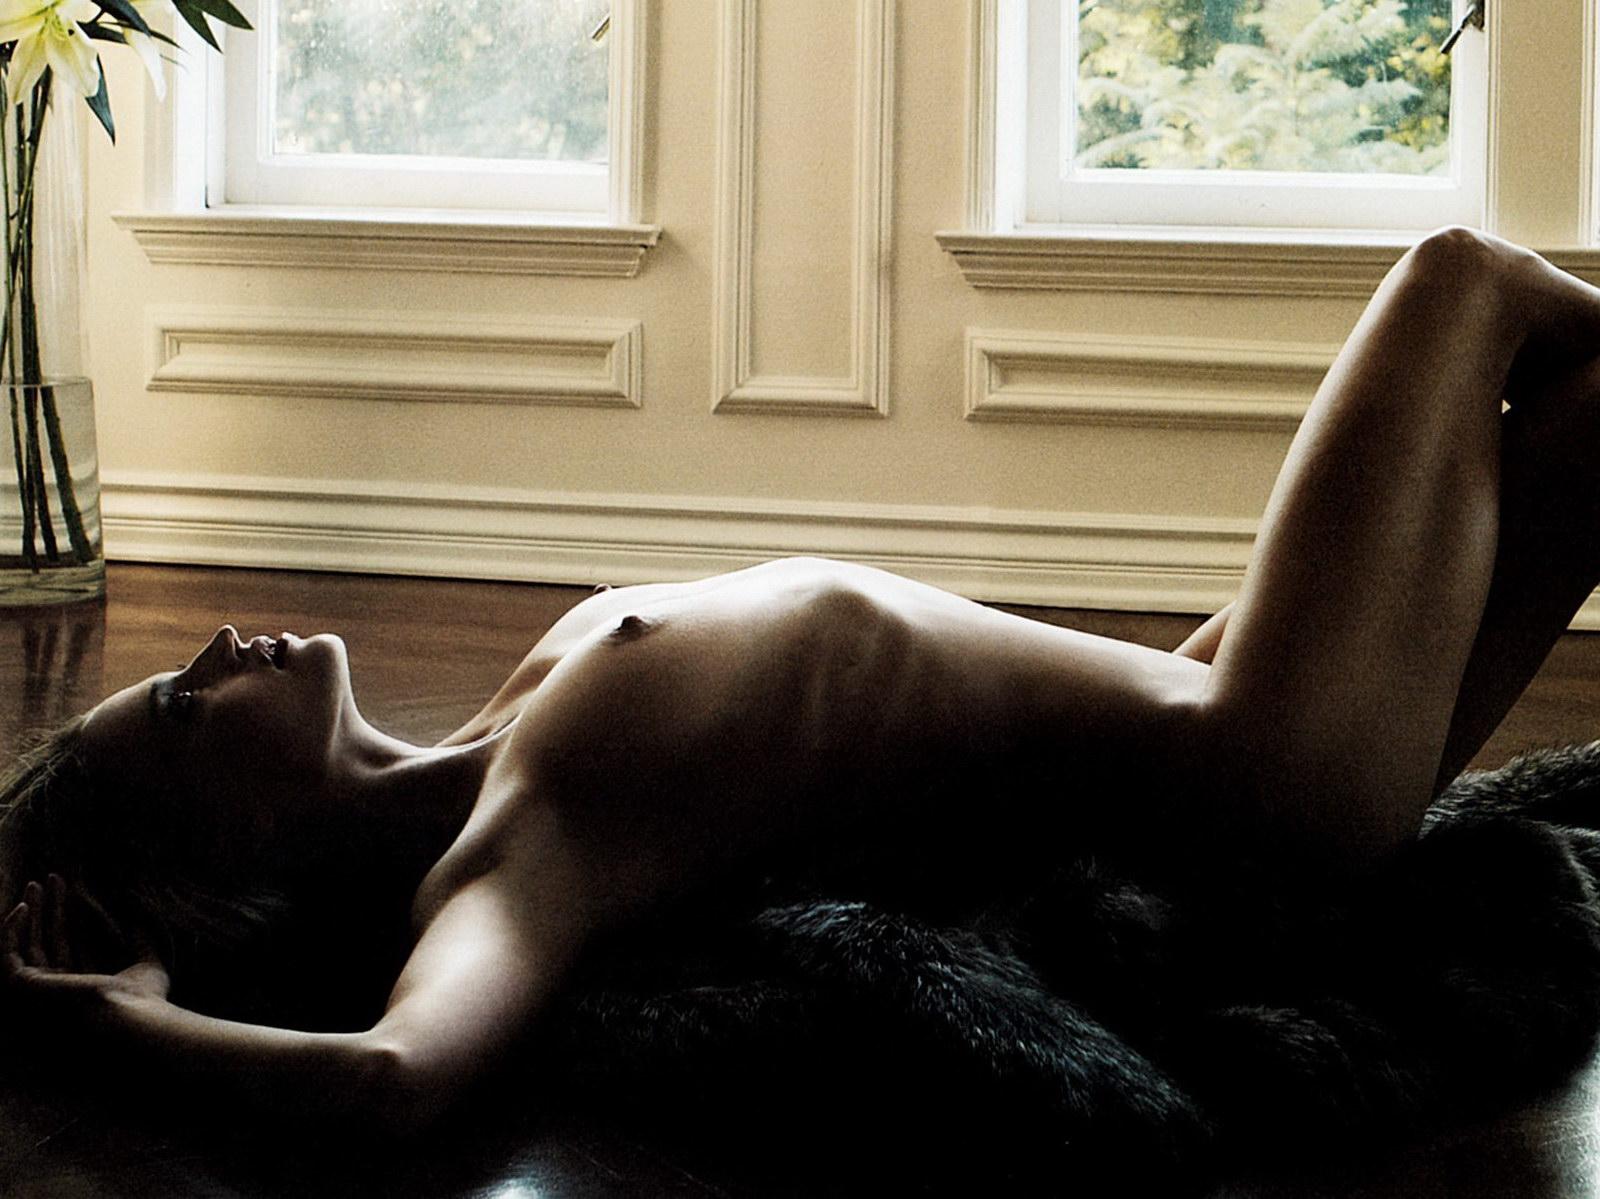 Estella warren smith nude